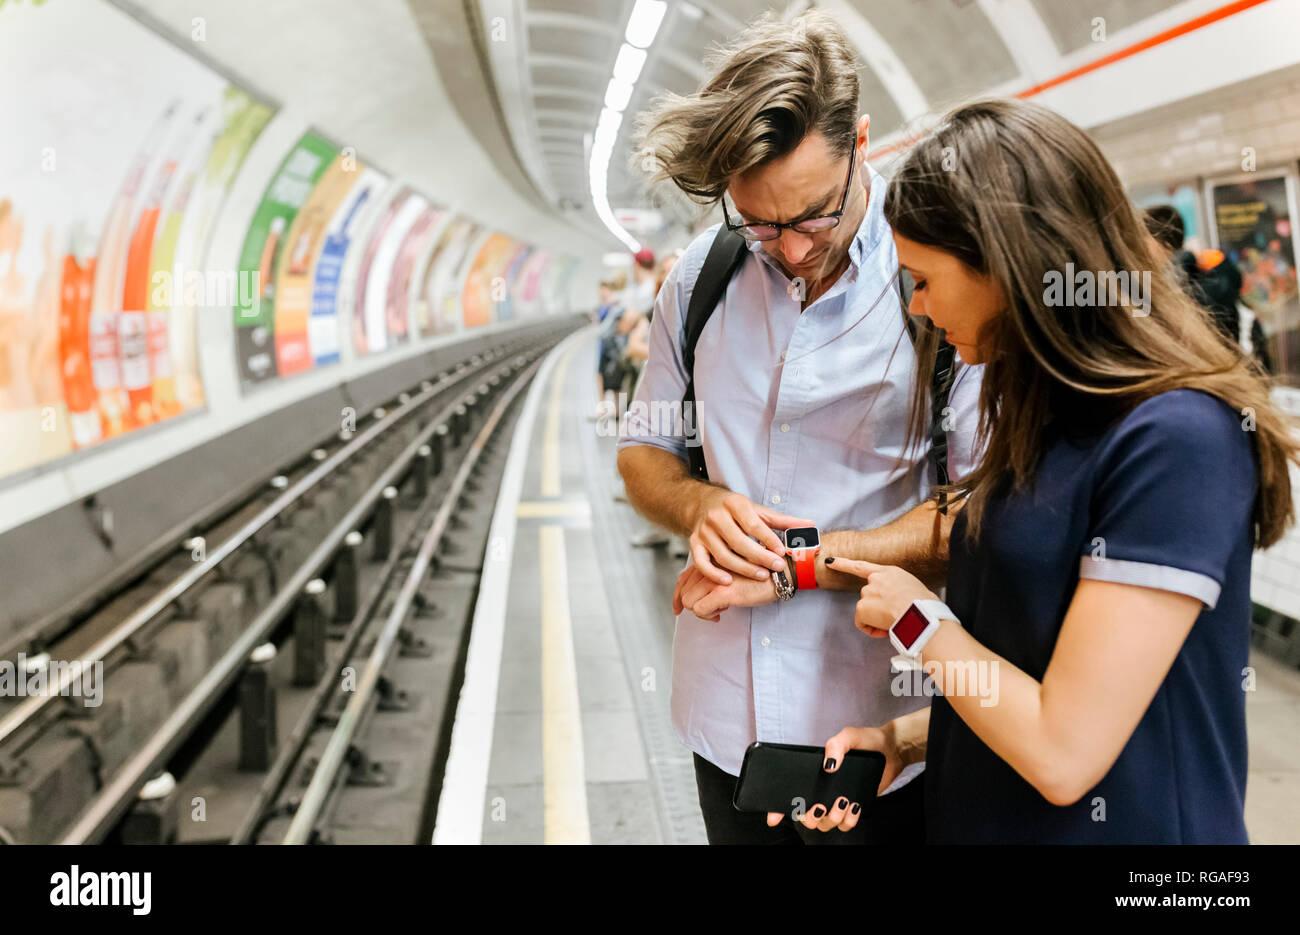 UK, London, couple waiting at   underground station platform looking at smartwatch - Stock Image